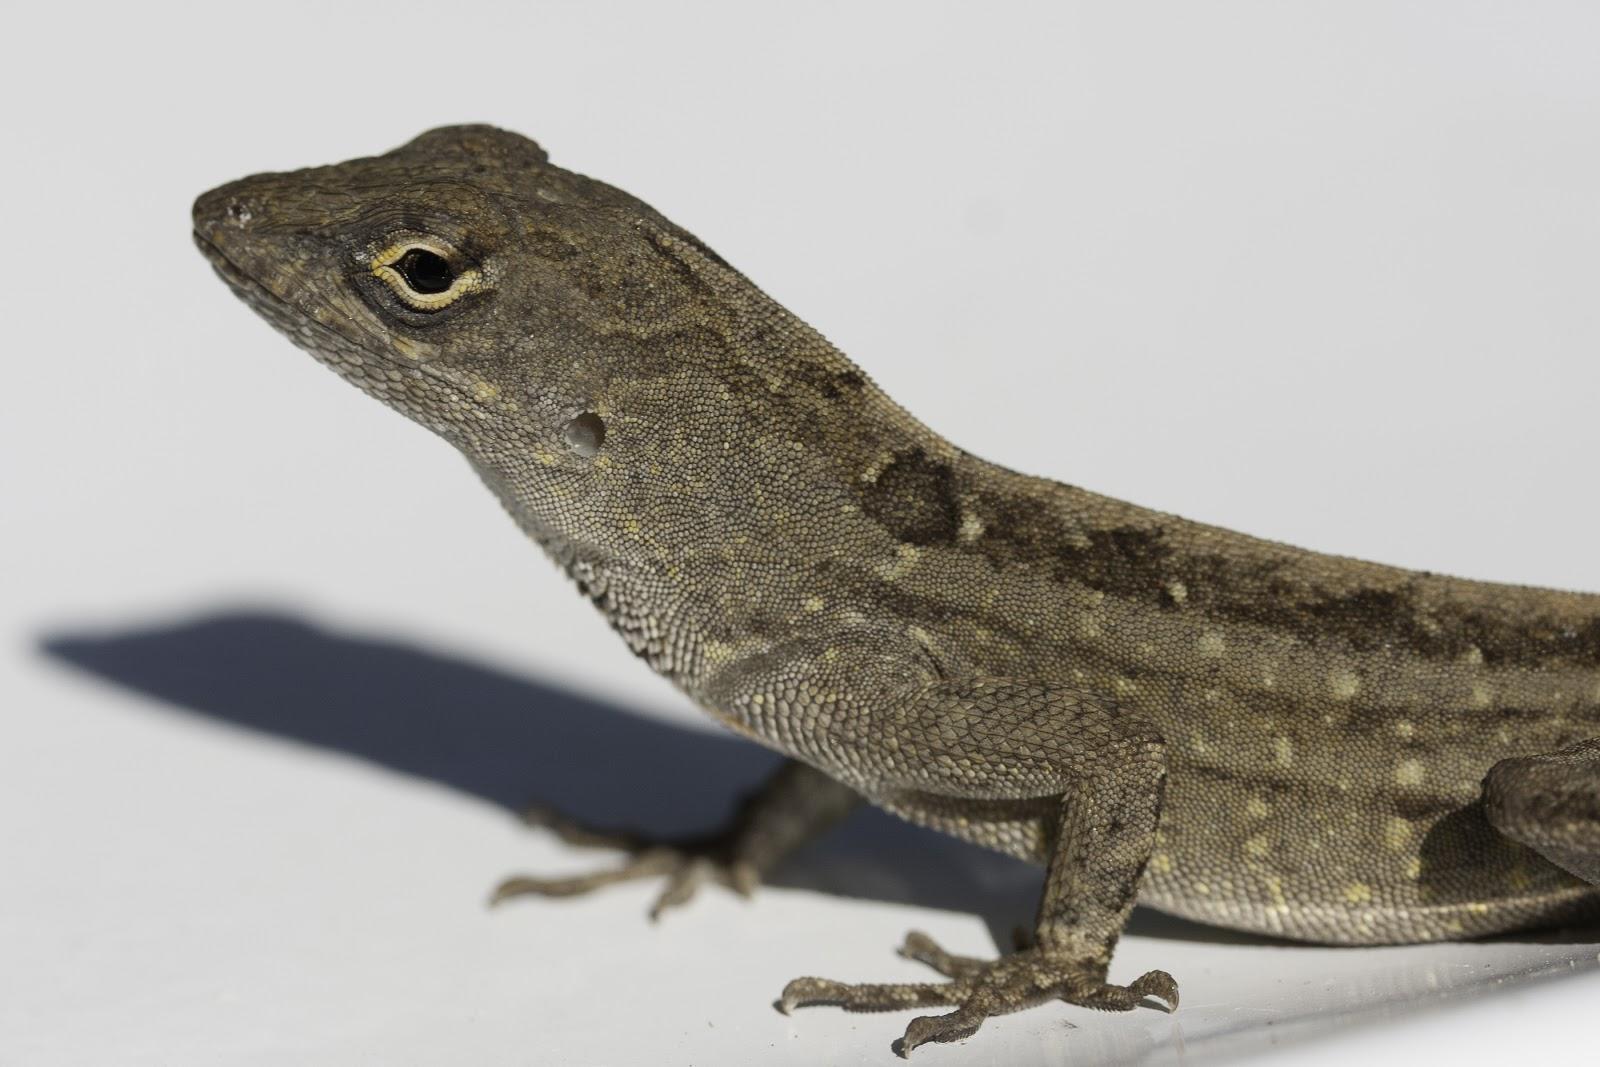 Two Garden Lizards | Hawaii Horticulture